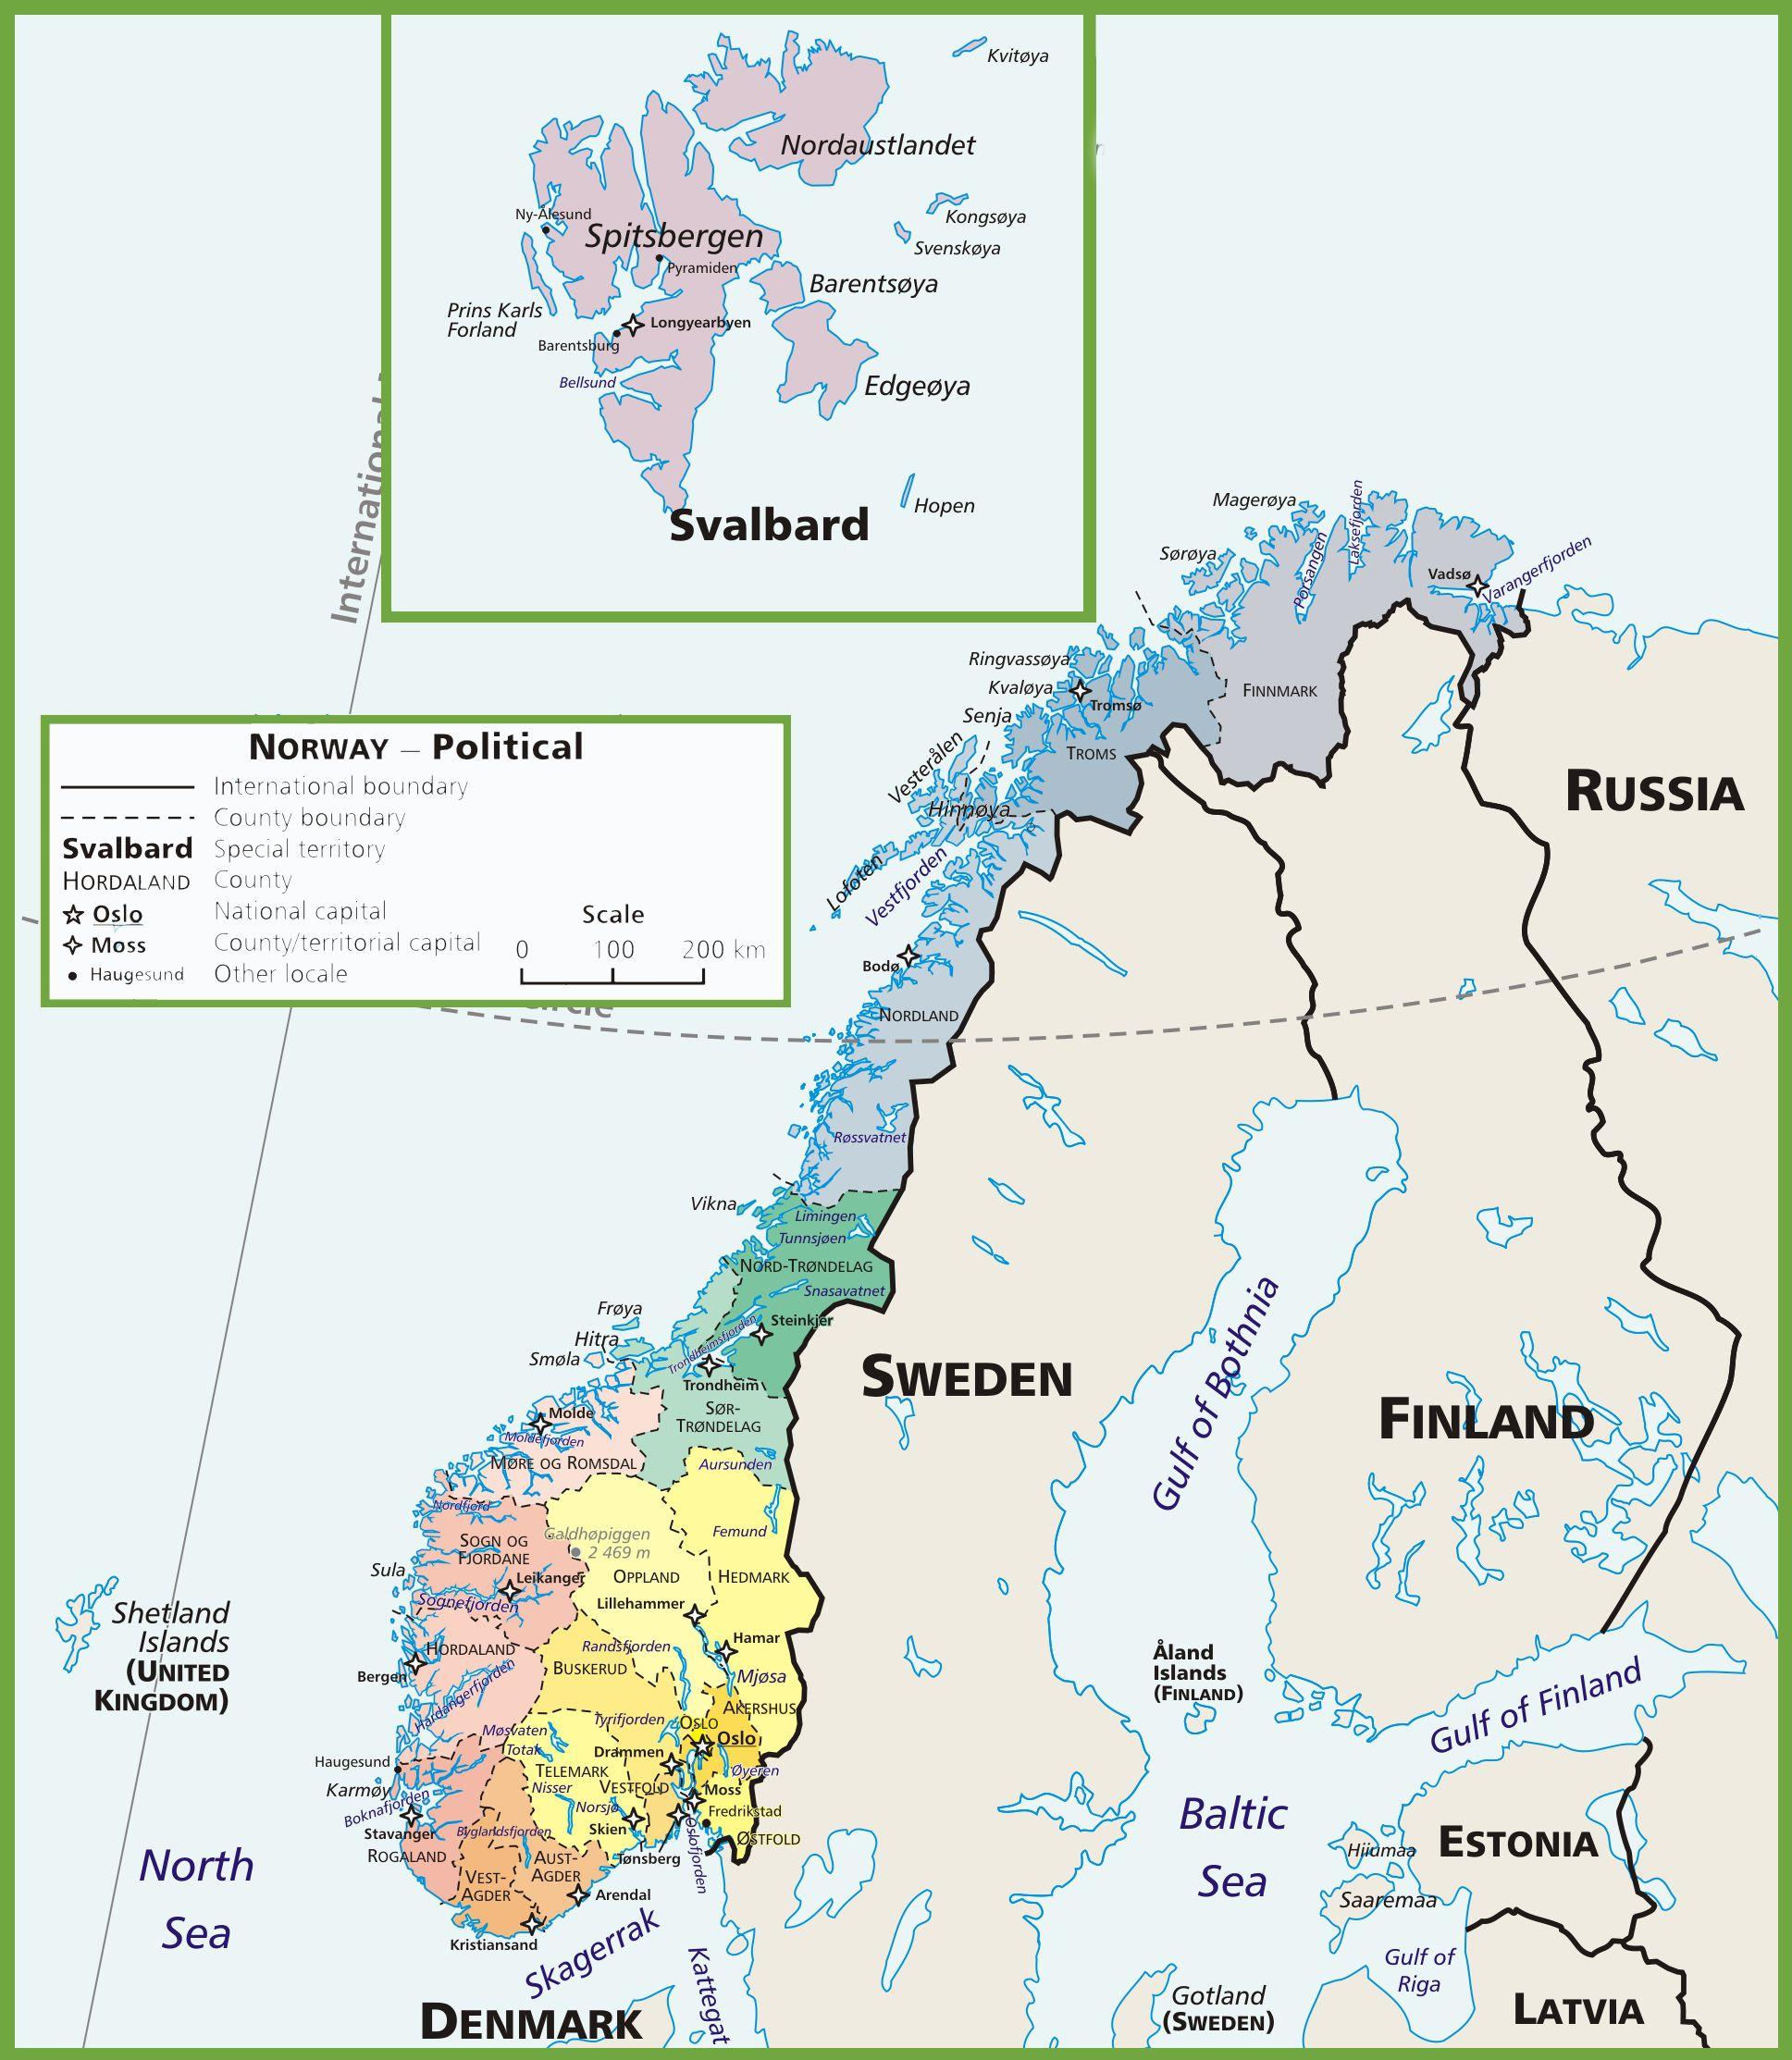 Carte de la Norvège et Svalbard